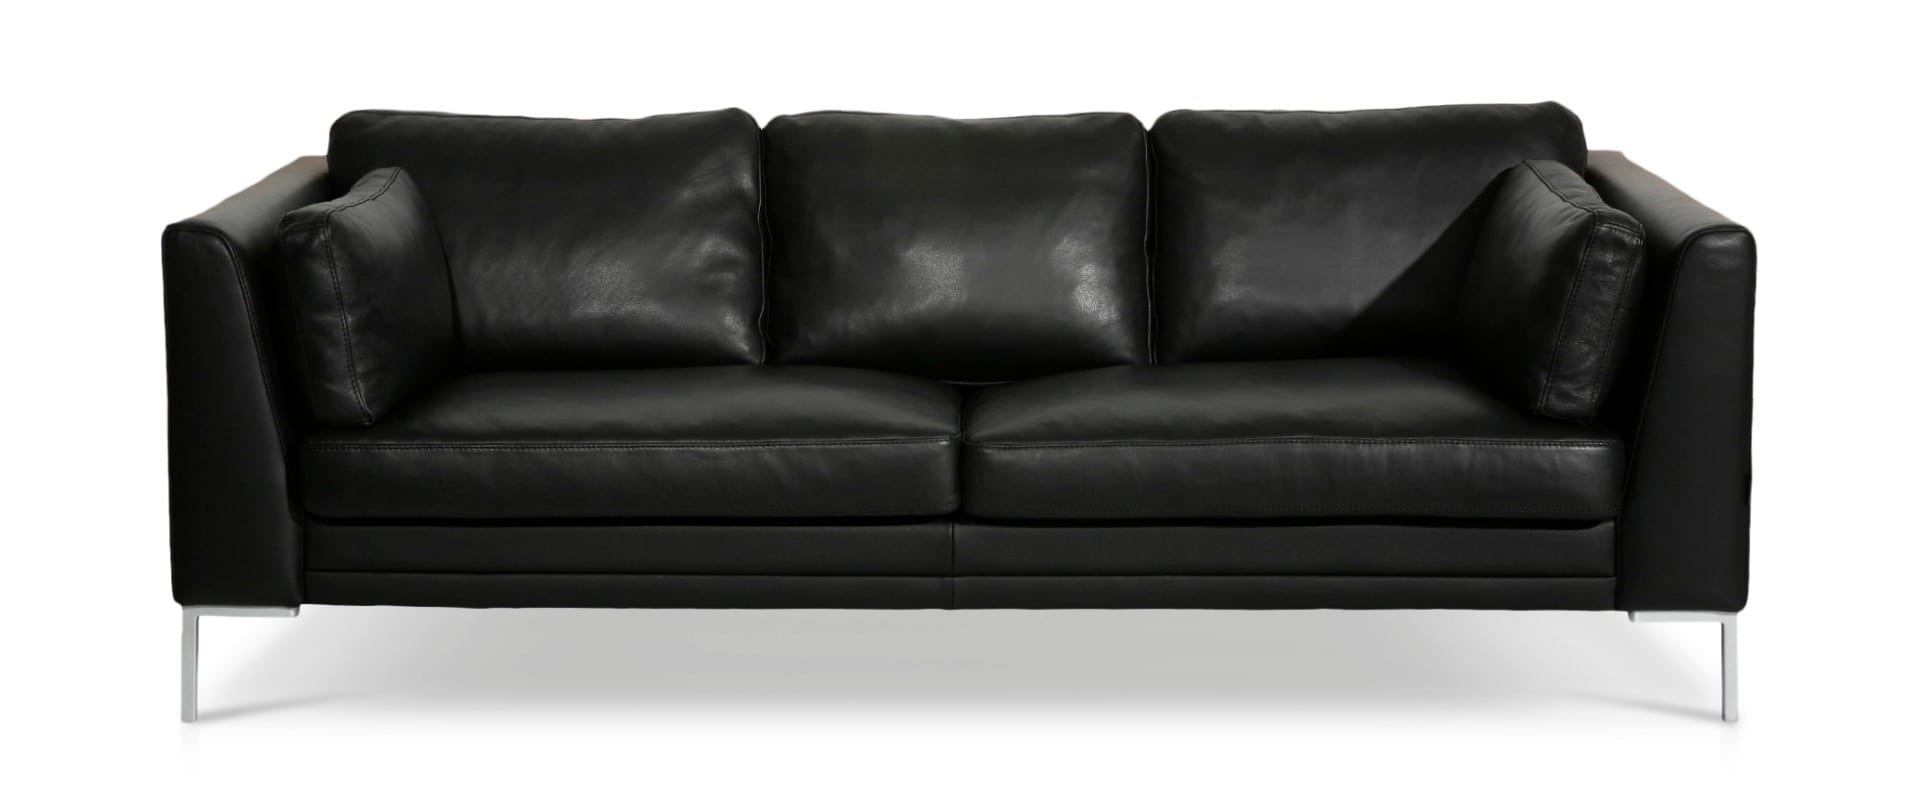 Superb Avignon 3 Seater Leather Sofa Home Interior And Landscaping Ponolsignezvosmurscom